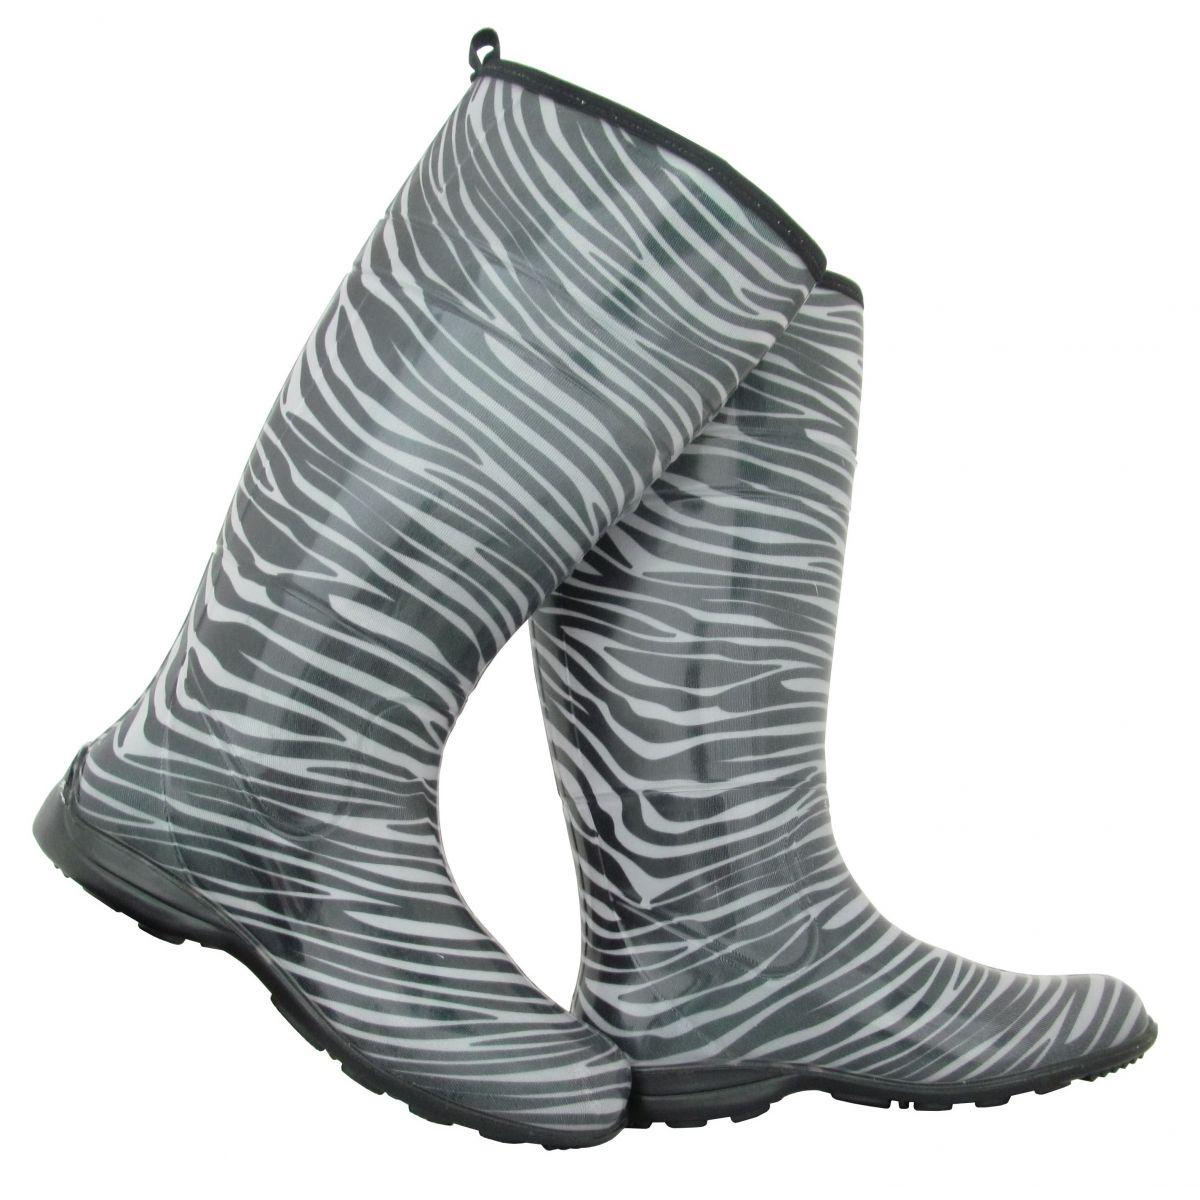 766de8bb4a5 Galocha Alpat Fashion Zebra - Alpat - rca - BOTA - Magazine Luiza